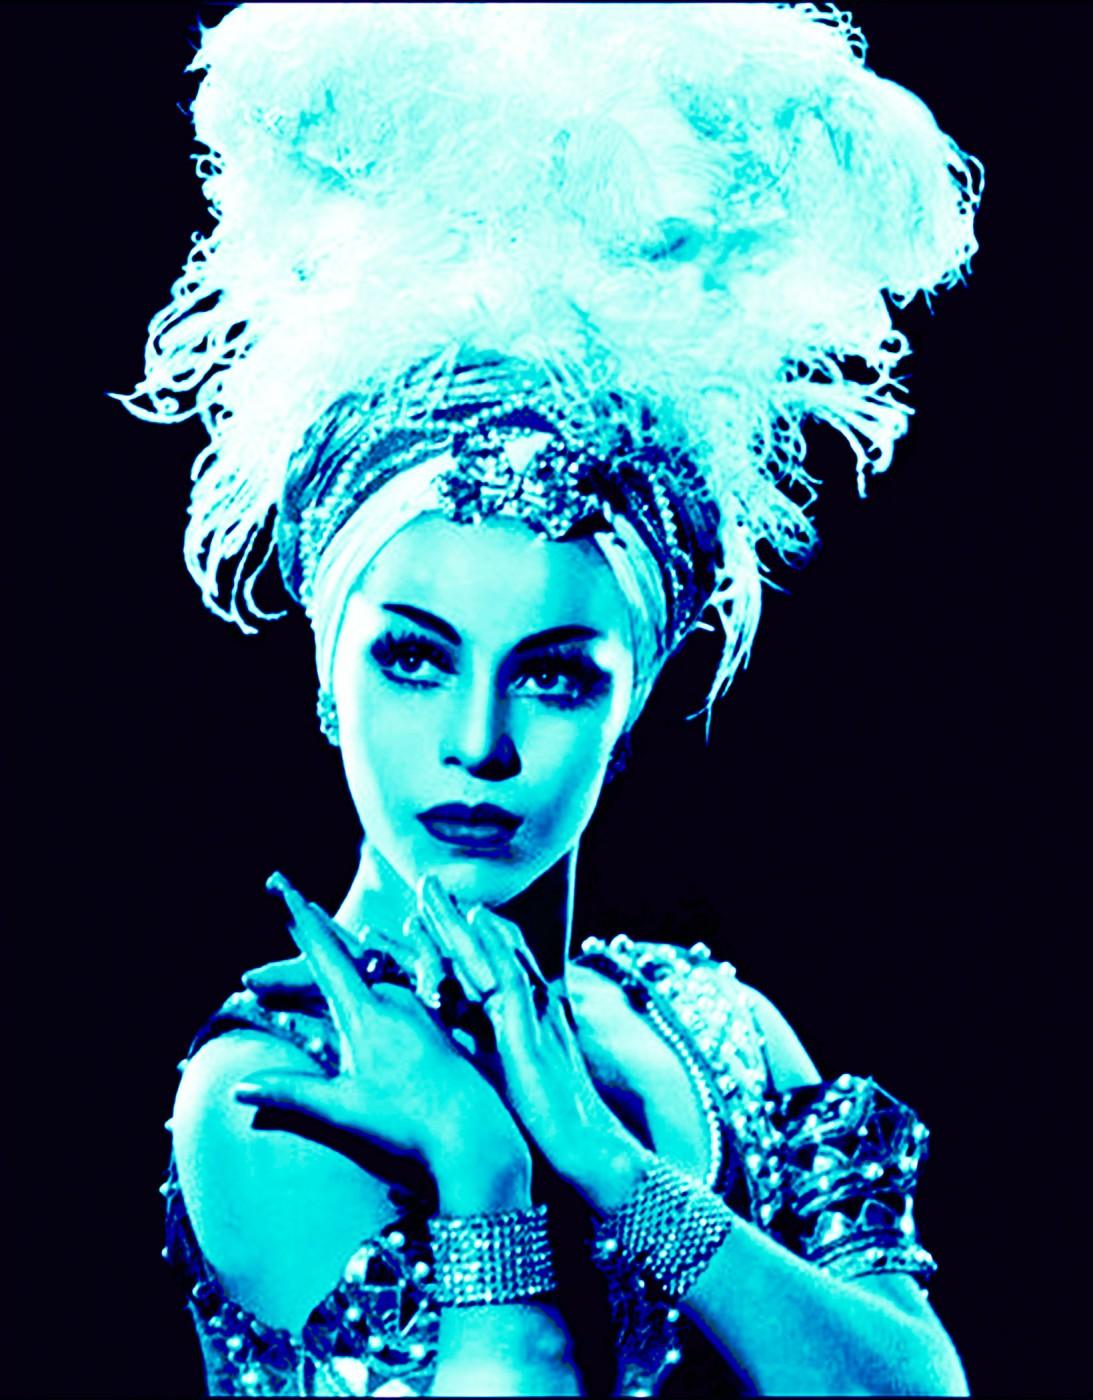 Dana Claxton, </span><span><em>Maria Tallchief in Turquoise</em>, </span><span>2013